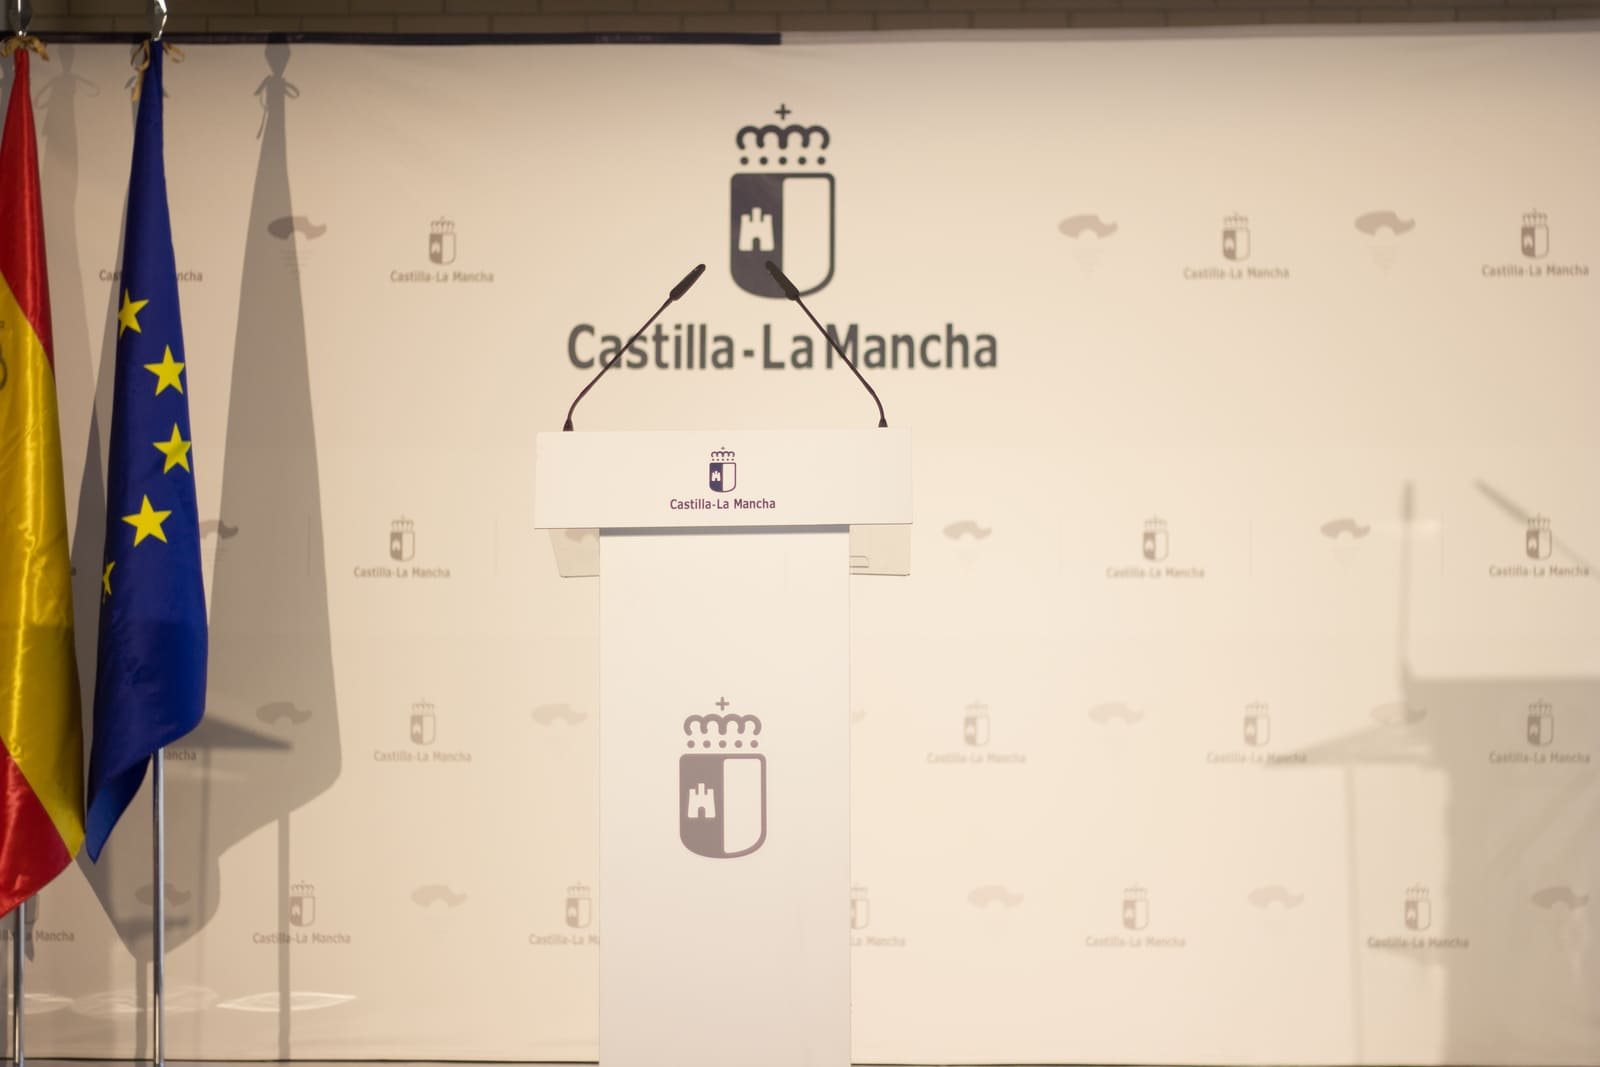 detalle atril sonido Castilla La Mancha con fondo lona evento